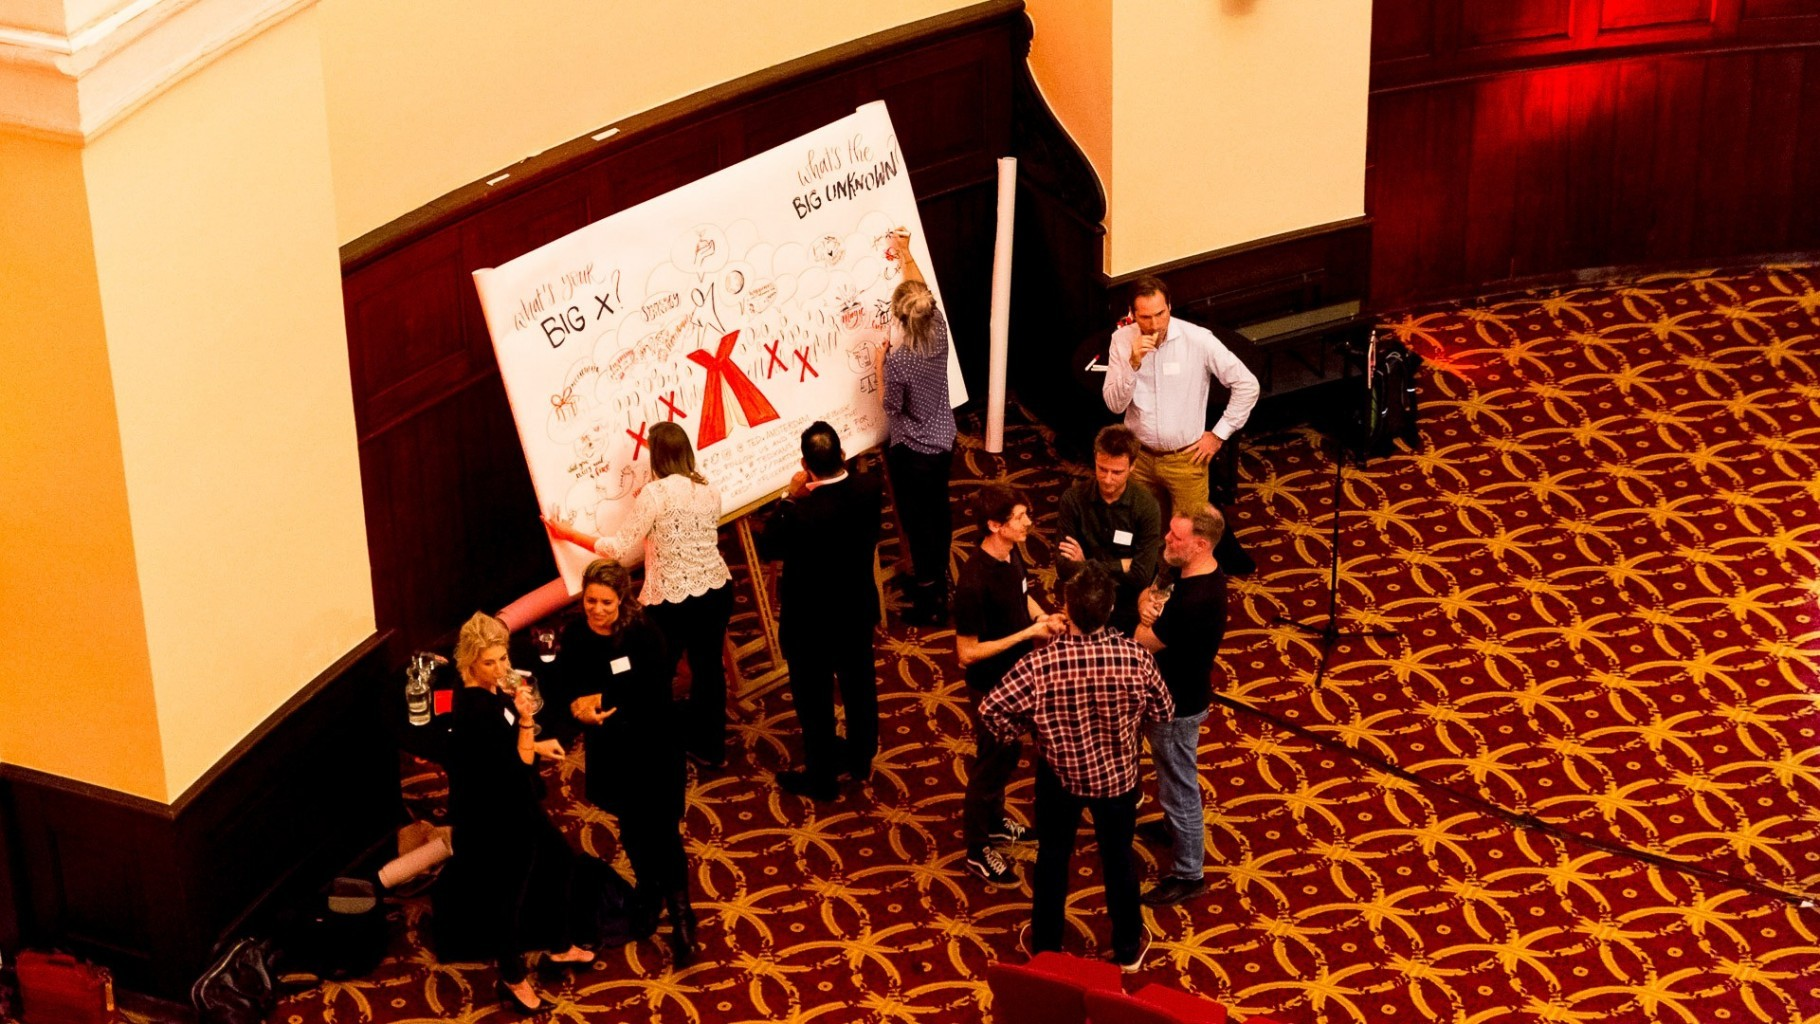 Event tedx visual visualizing illustrator